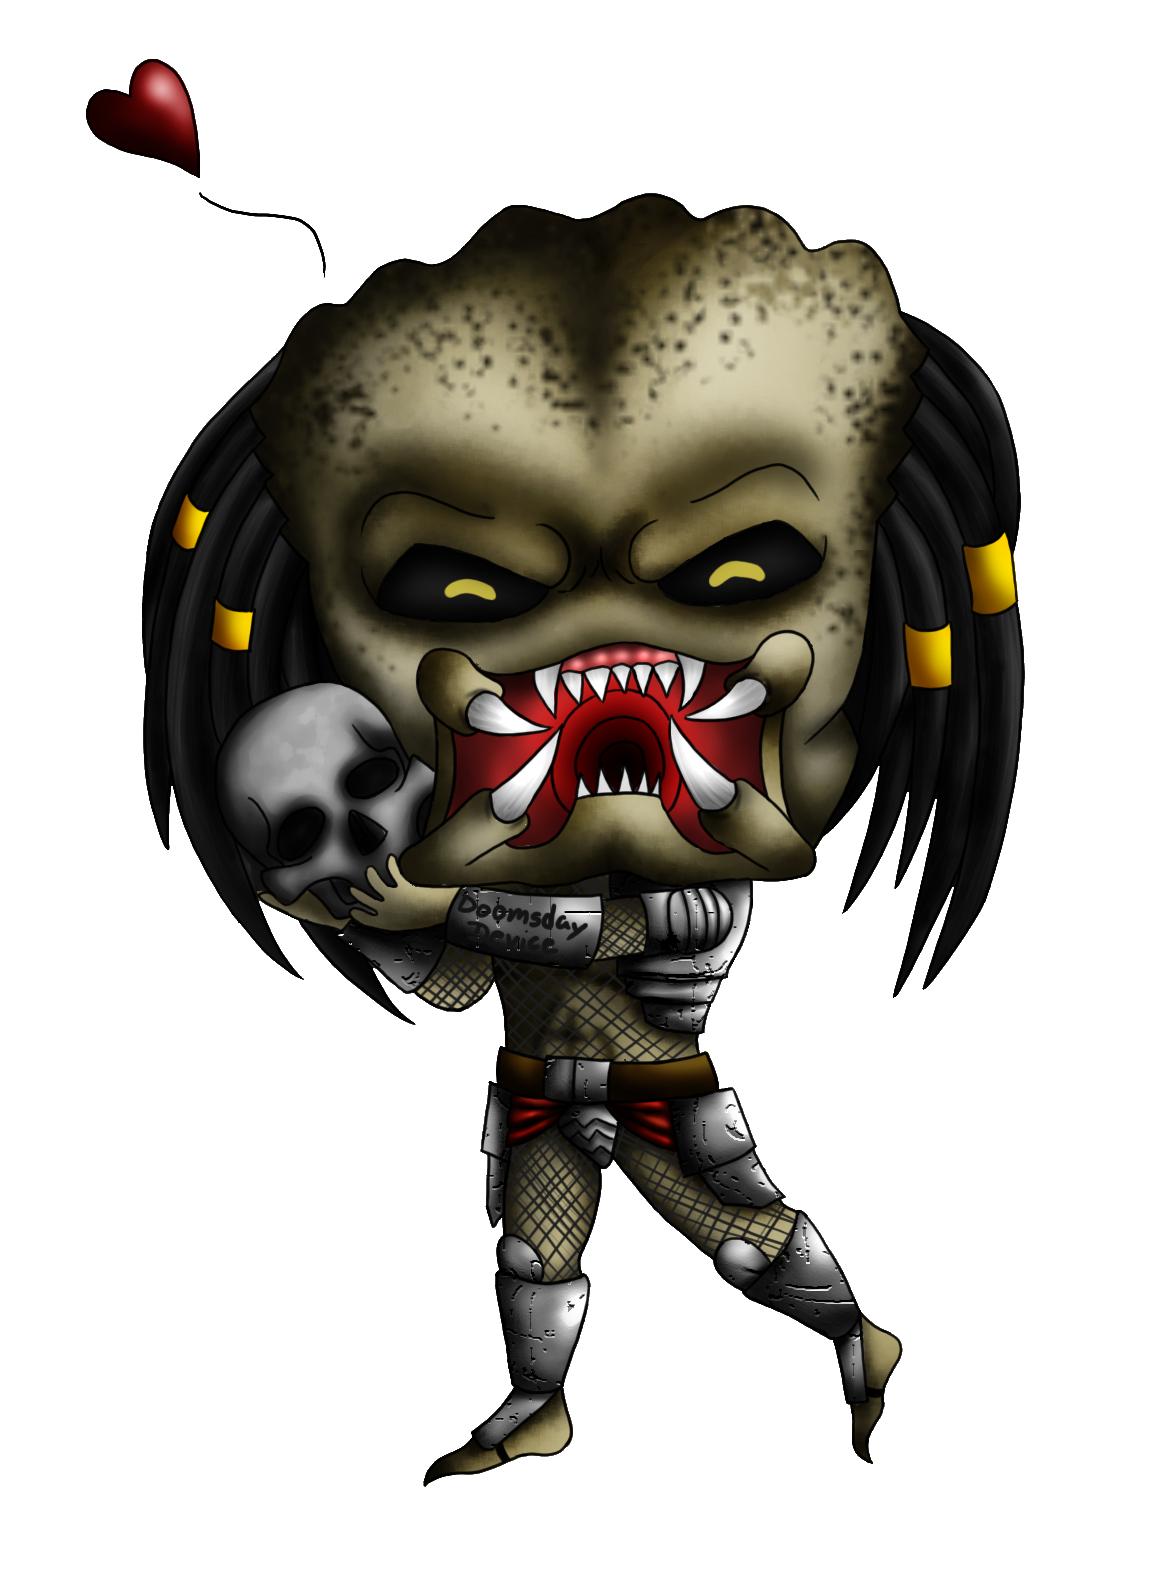 Chibi Predator